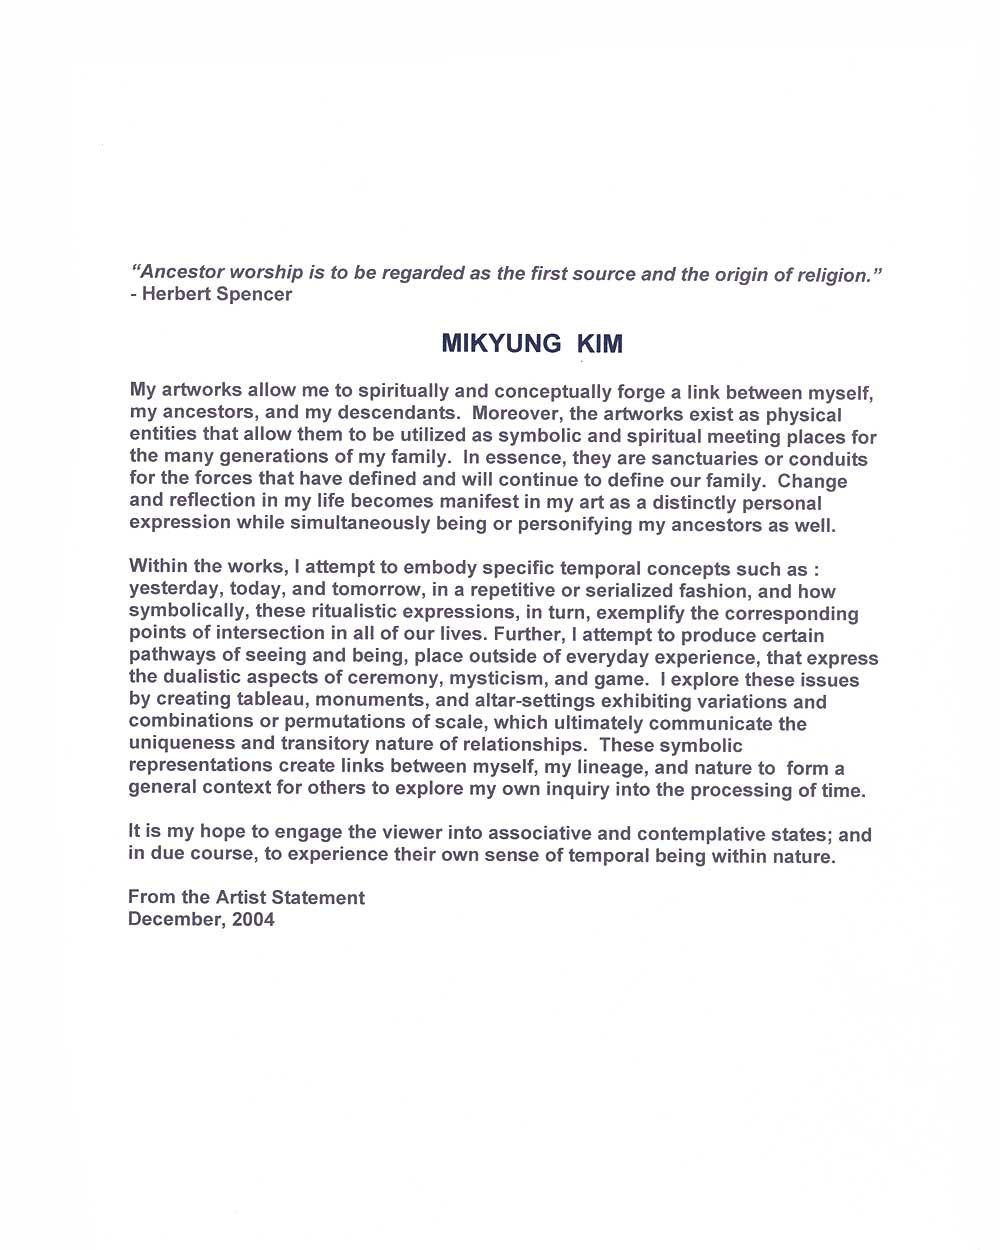 Mikyung Kim's Artist Statement, pg 2